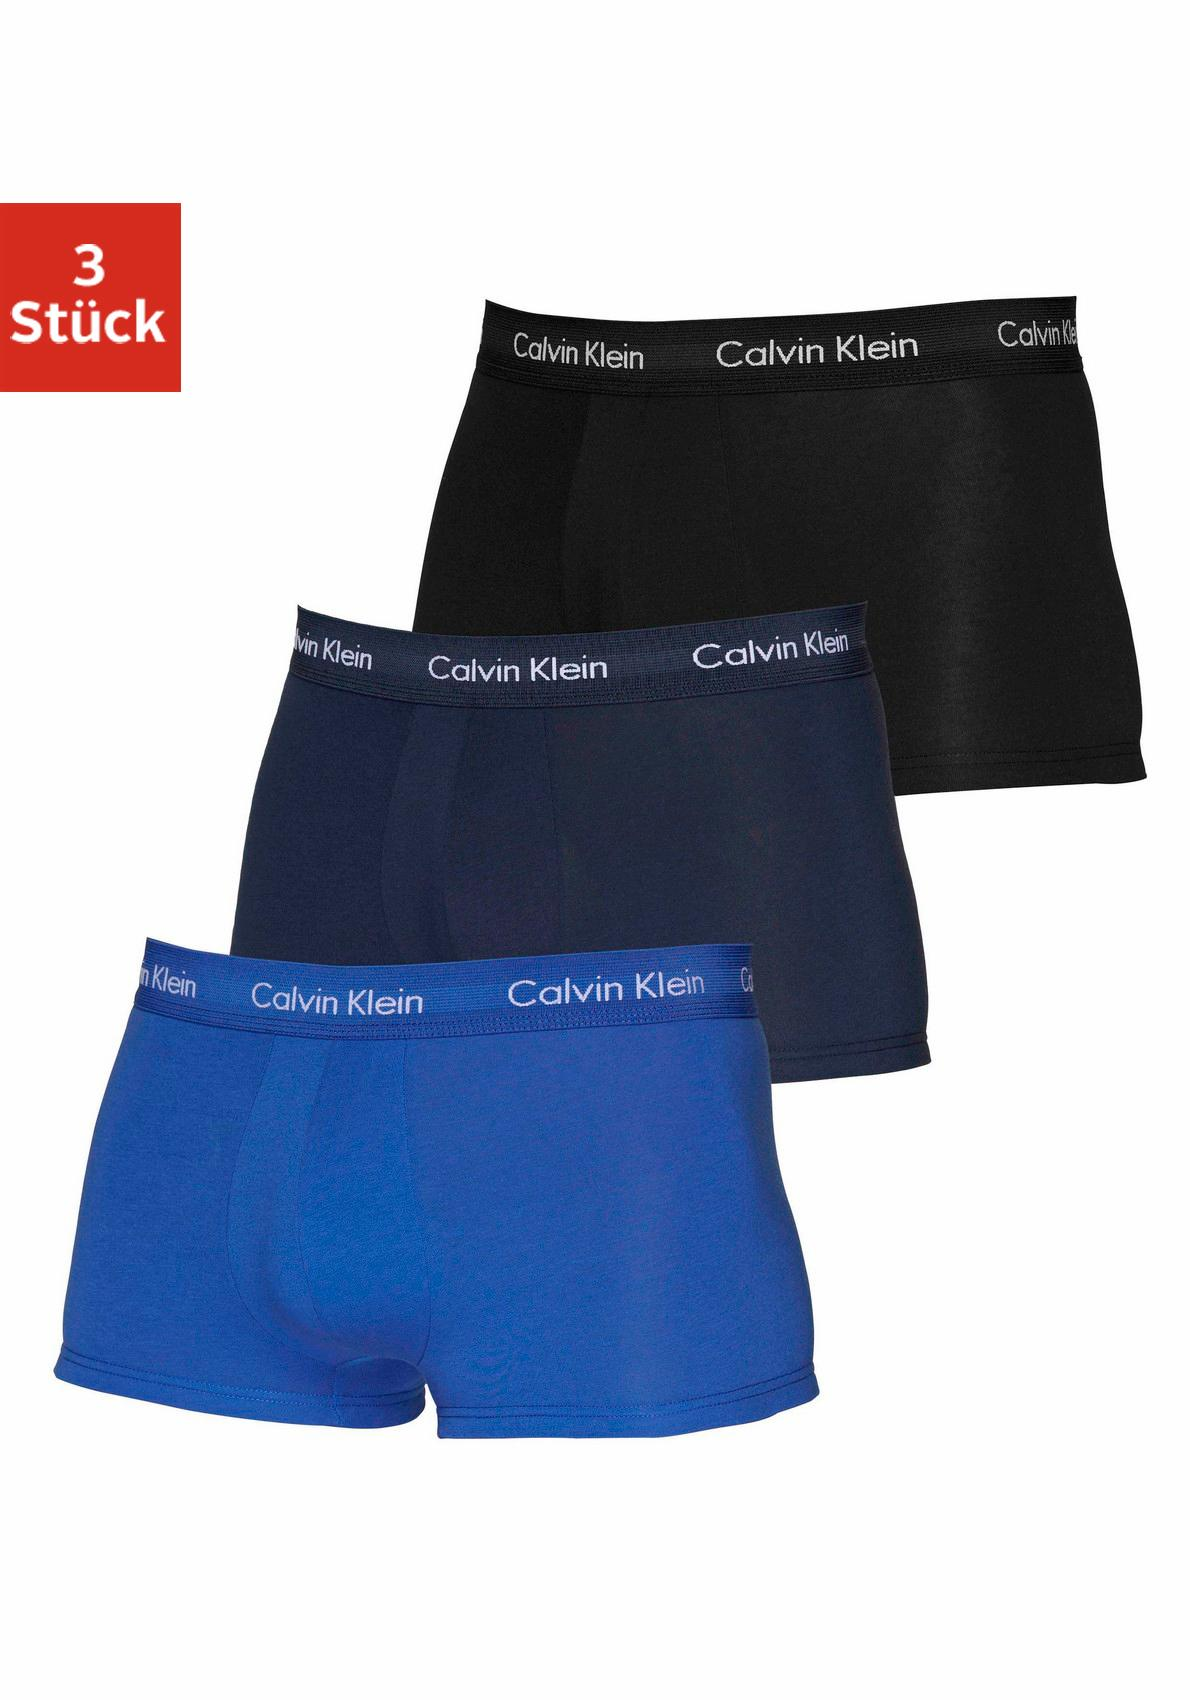 Calvin Klein Hipster (3 Stück)